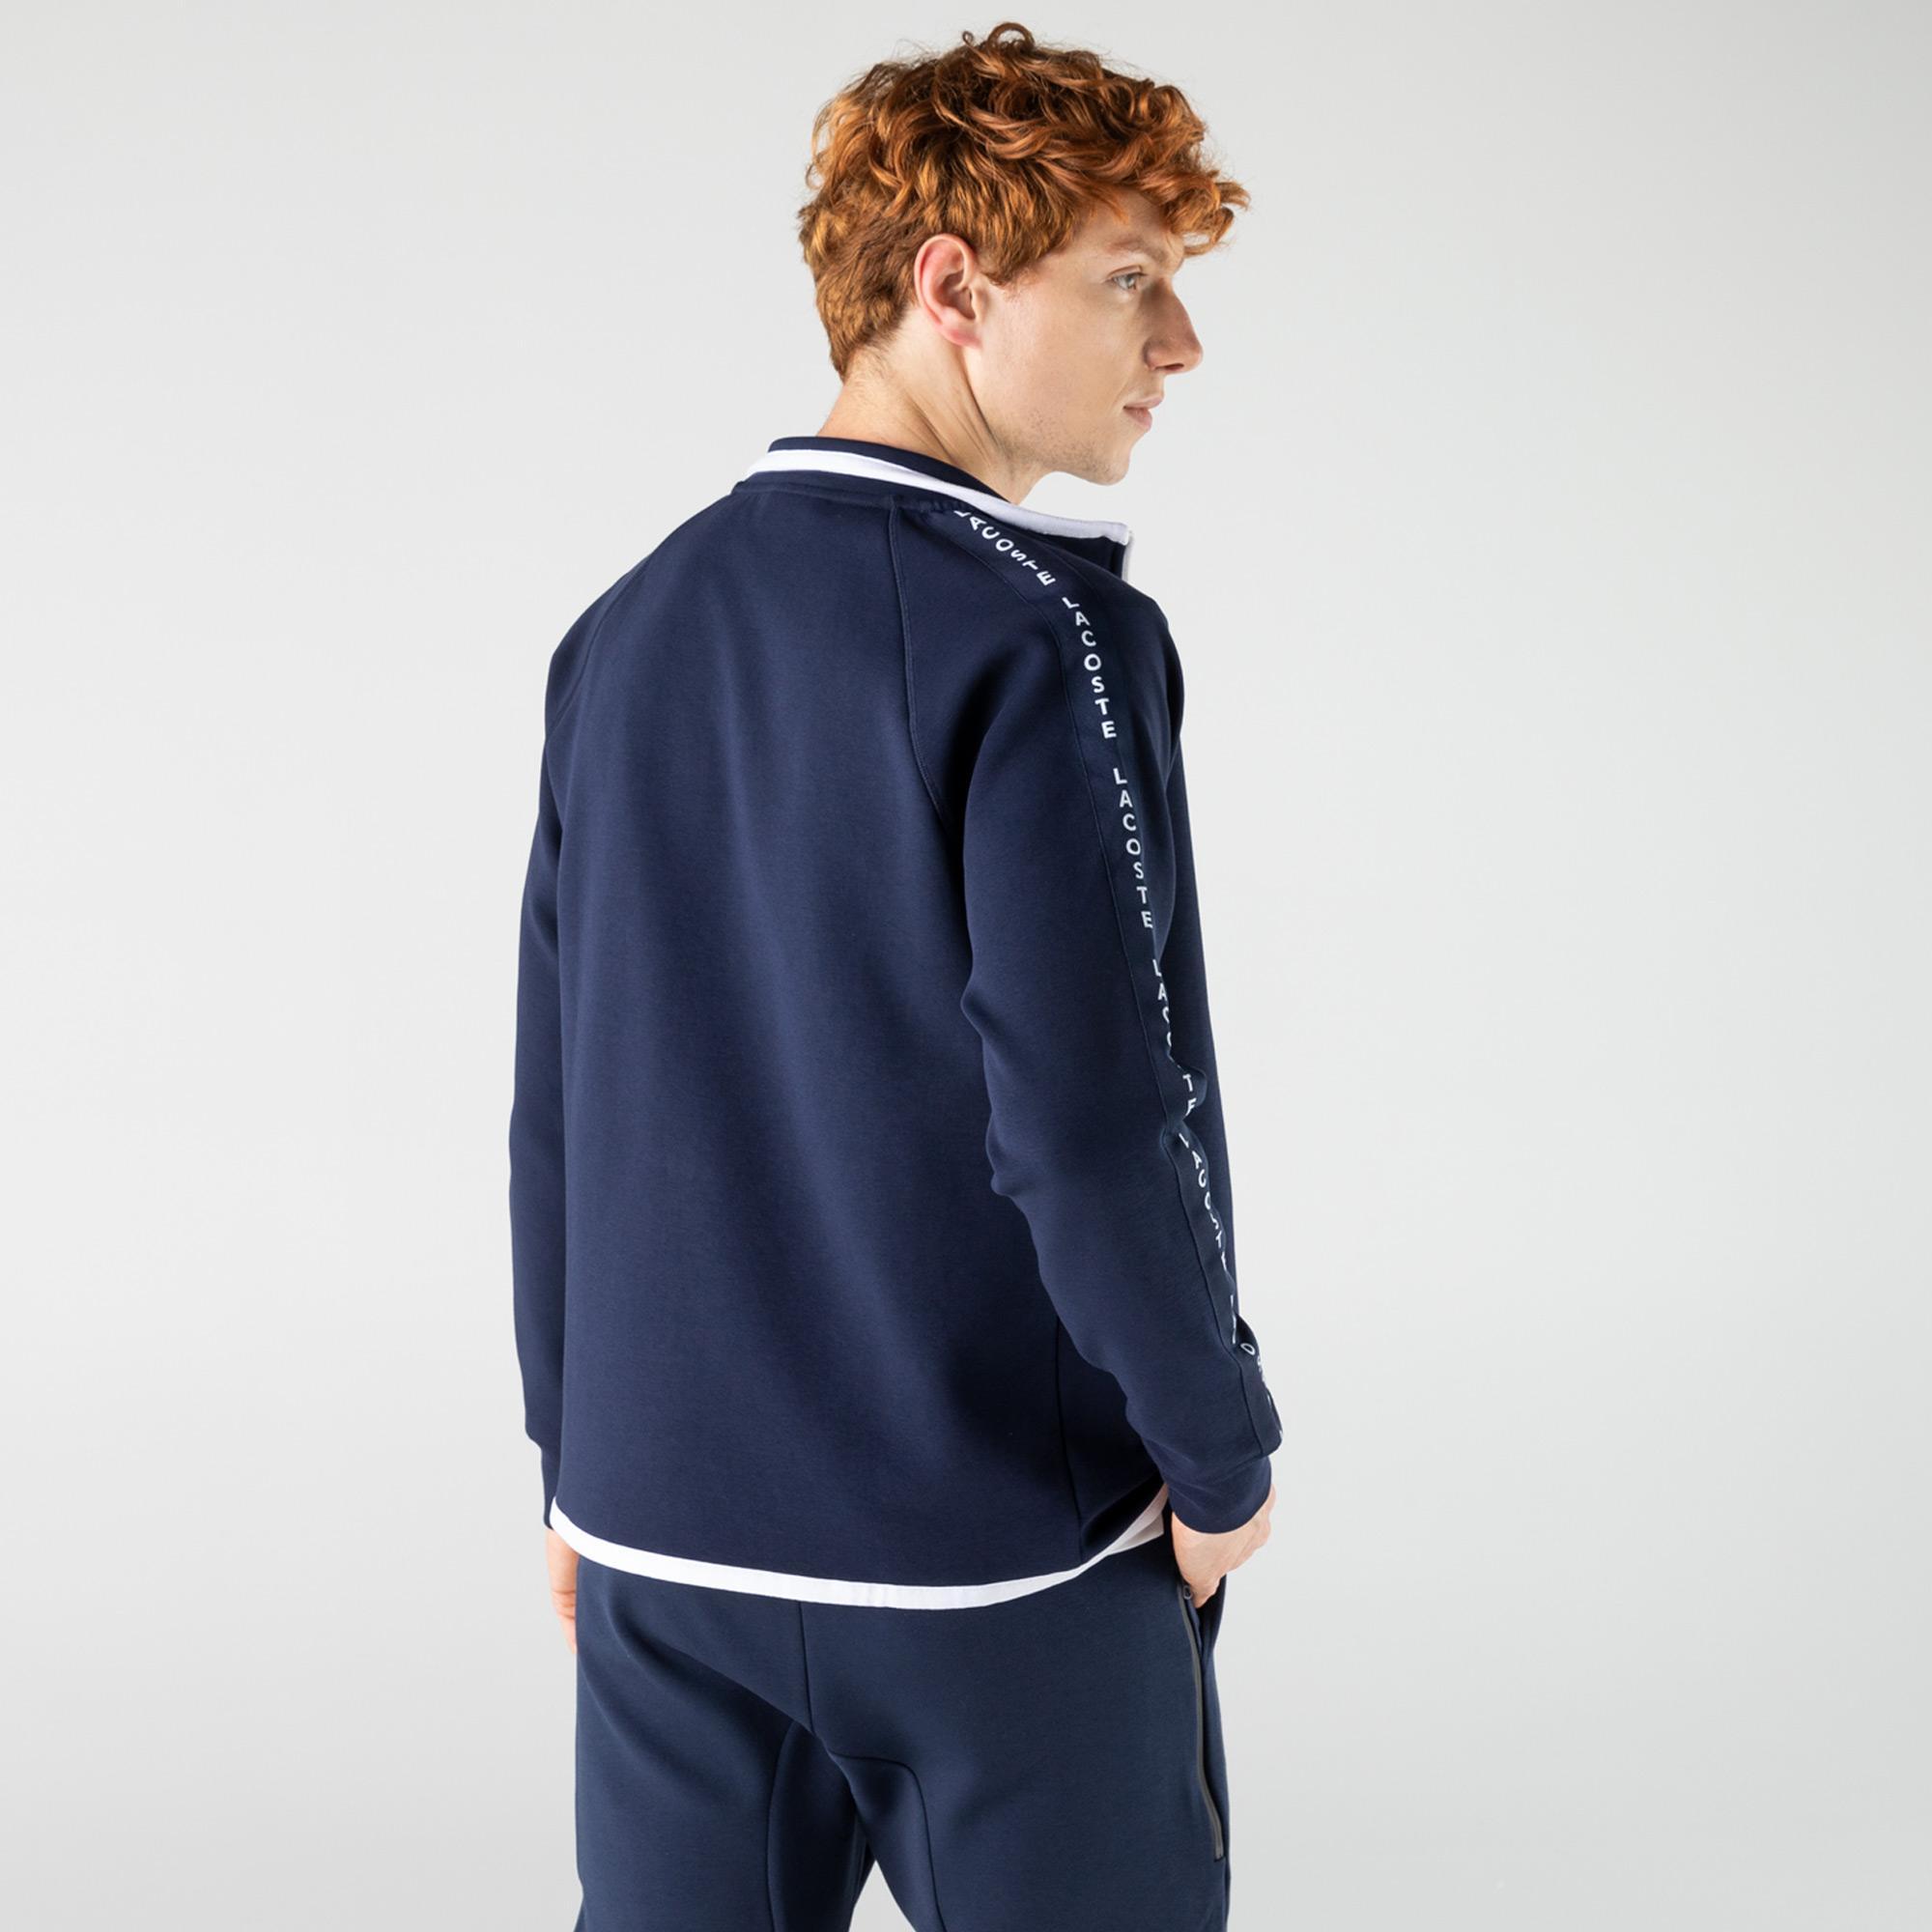 Lacoste Erkek Regular Fit Fermuarlı Lacivert Sweatshirt